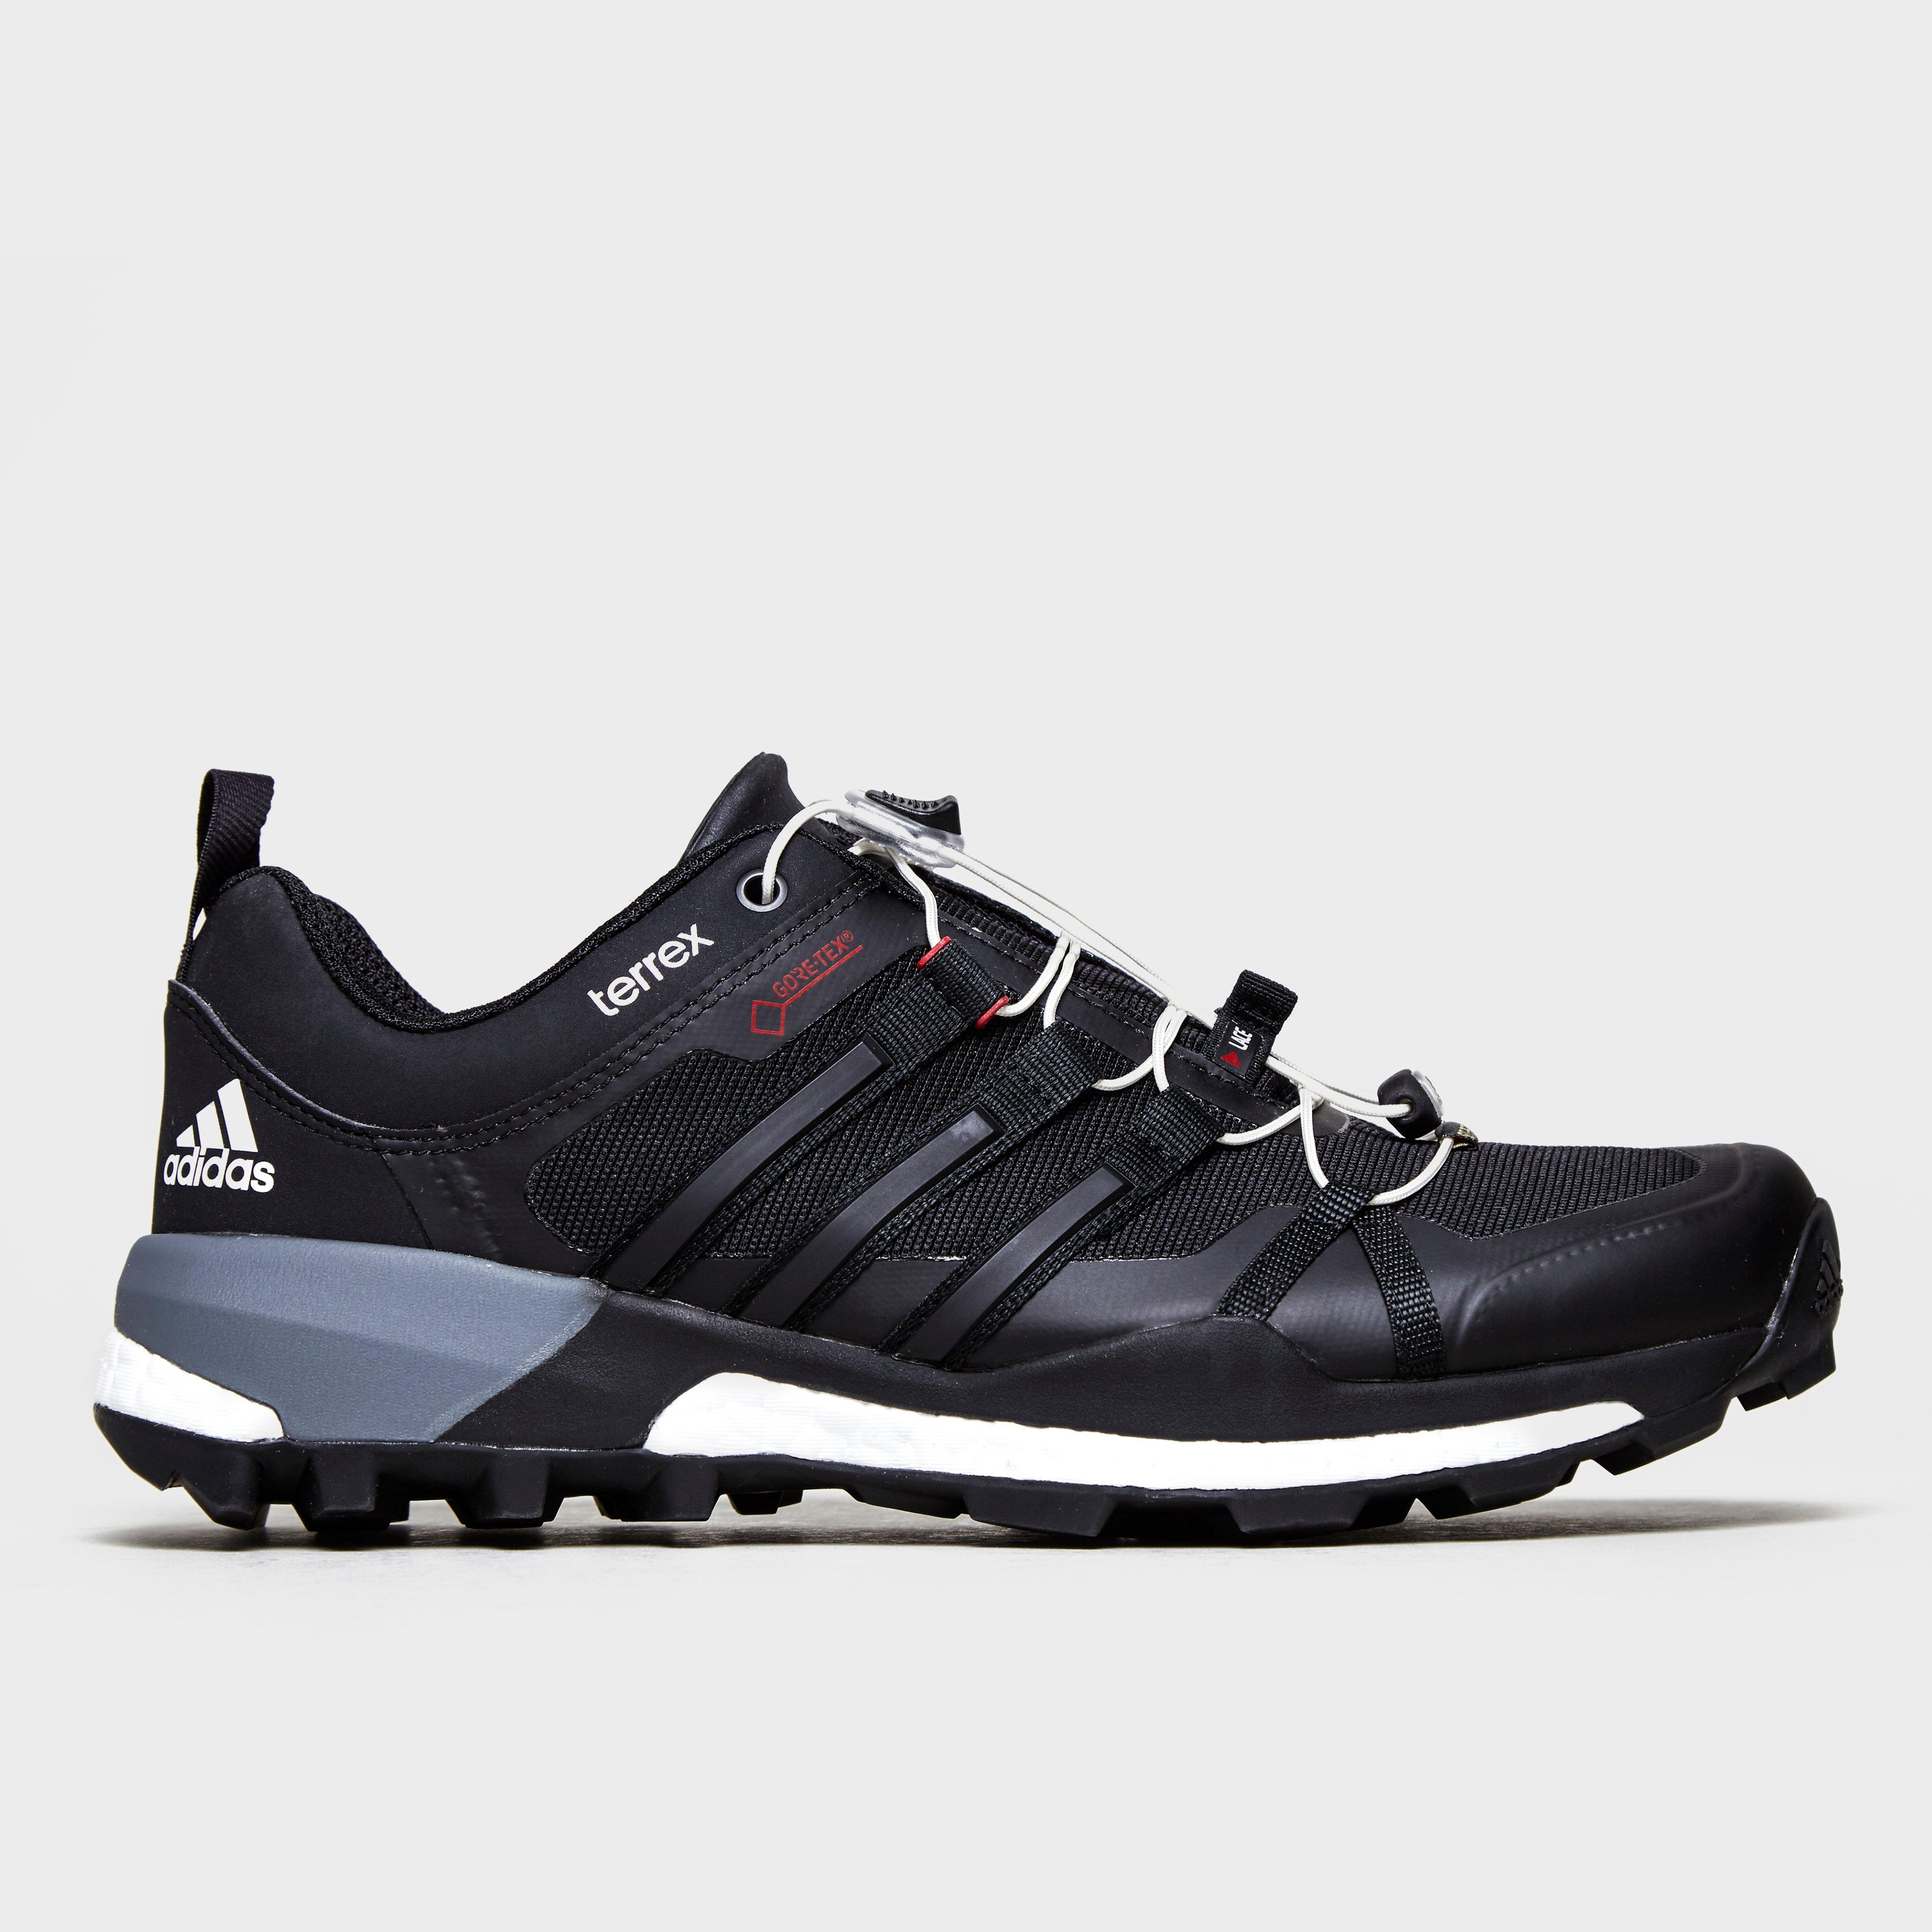 Adidas Mens Terrex Skychaser GORETEX Shoe Black